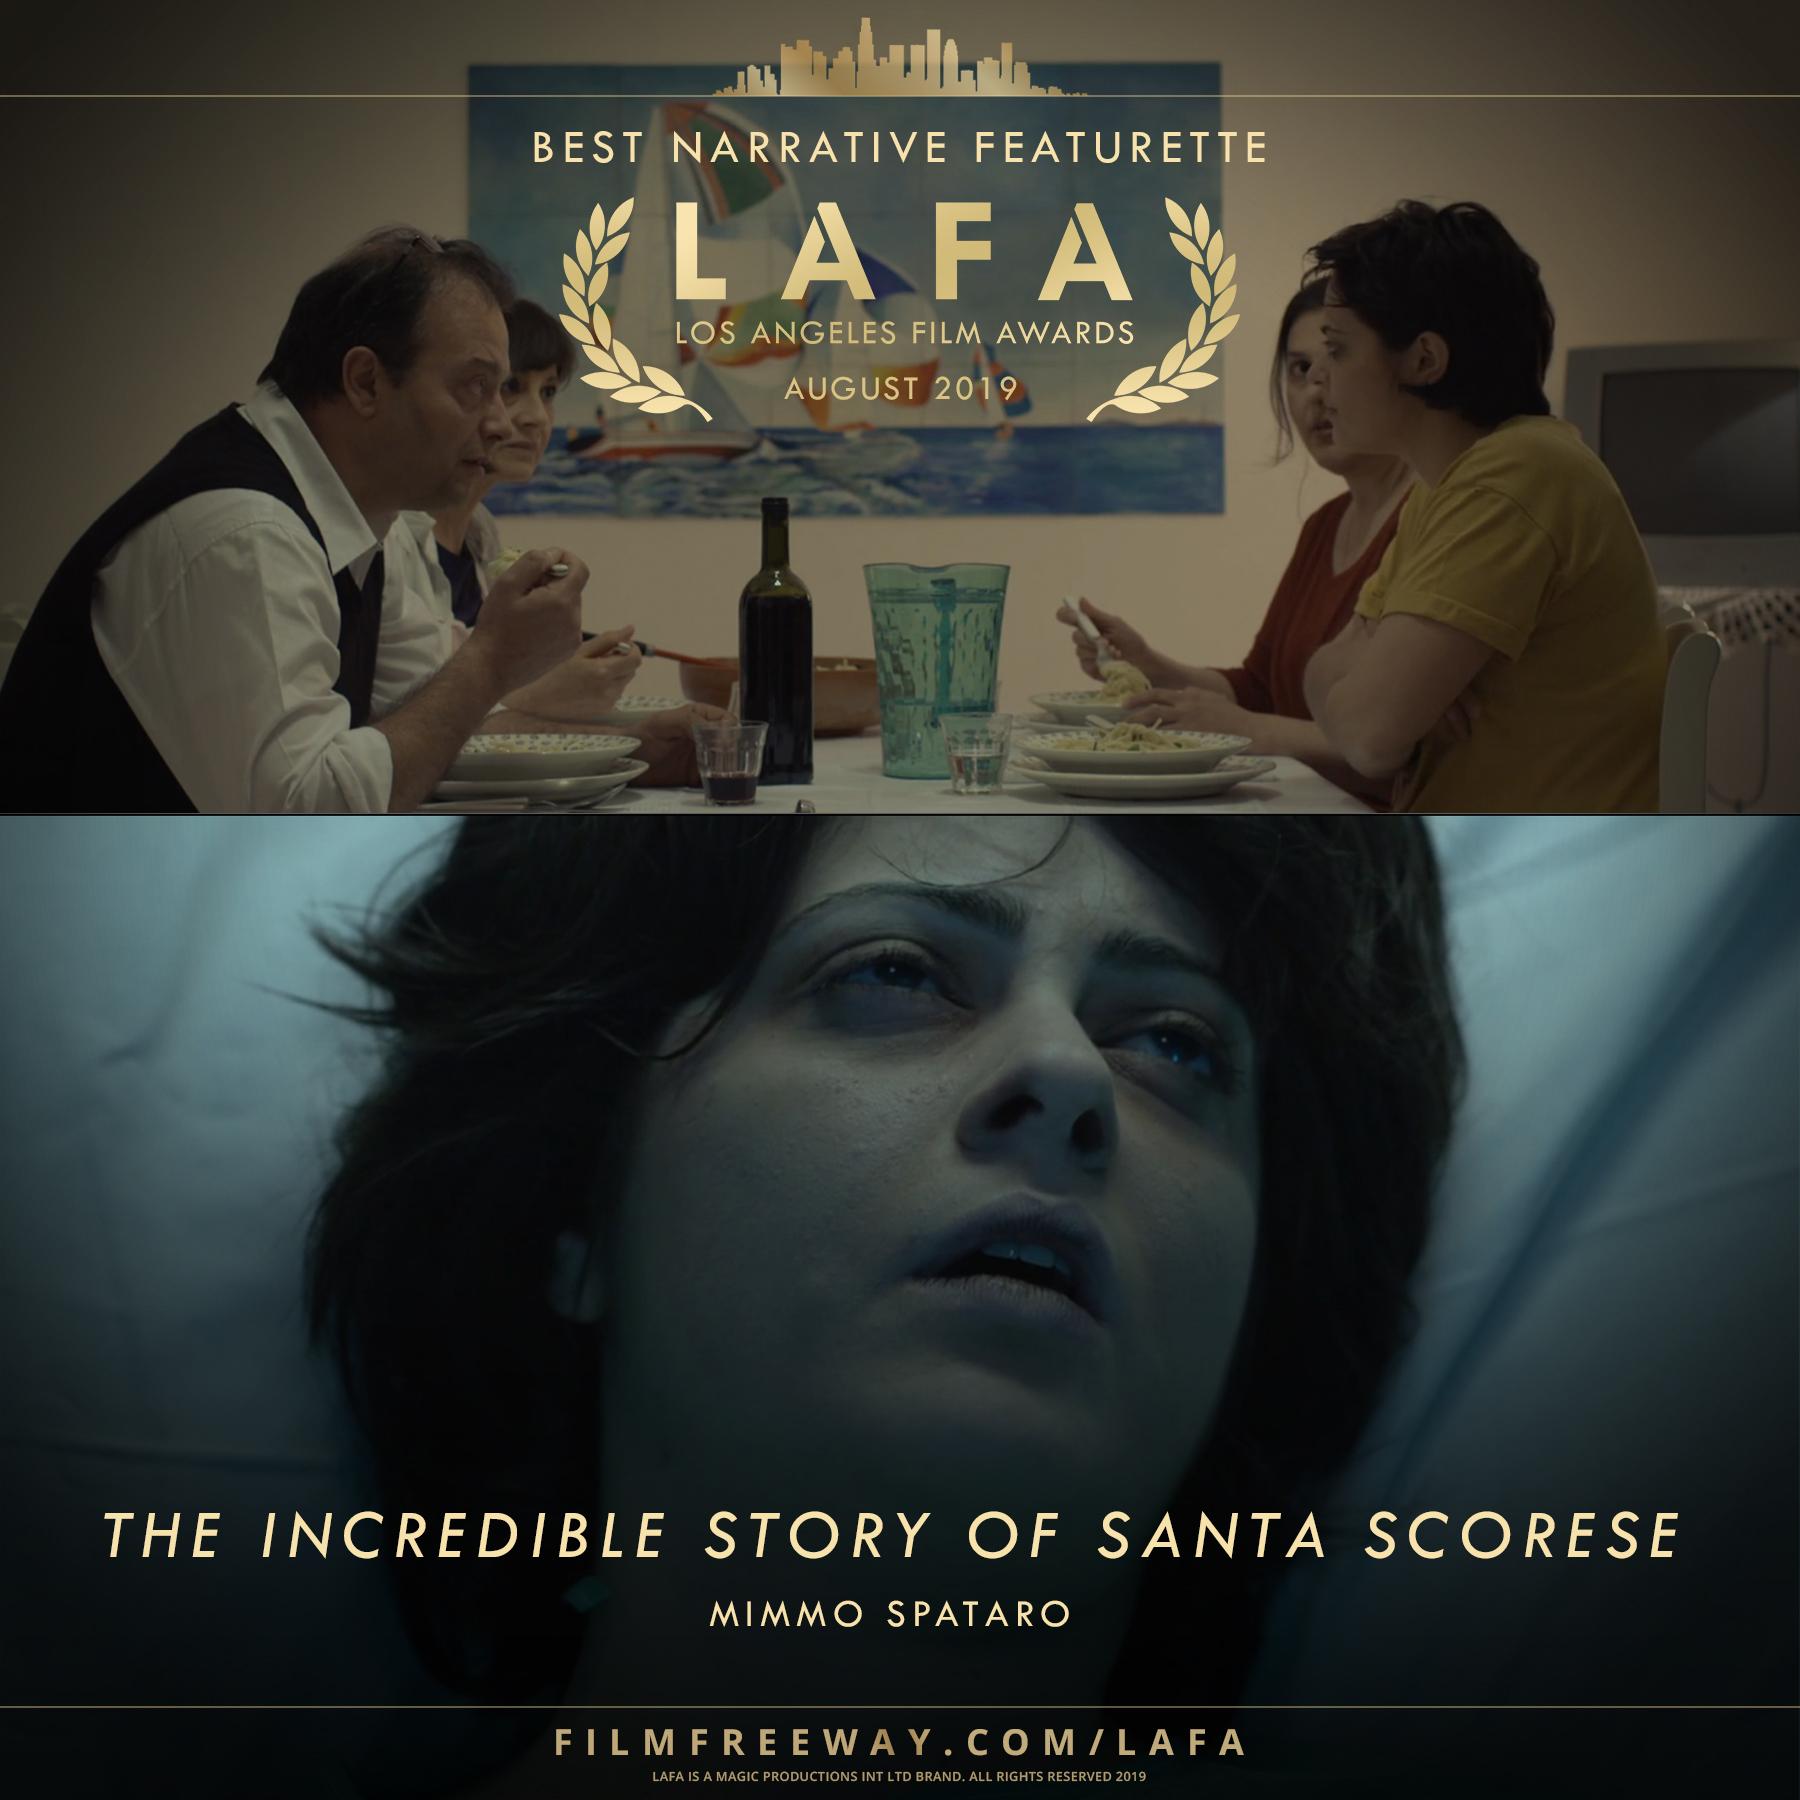 THE INCREDIBLE STORY OF SANTA SCORESE de